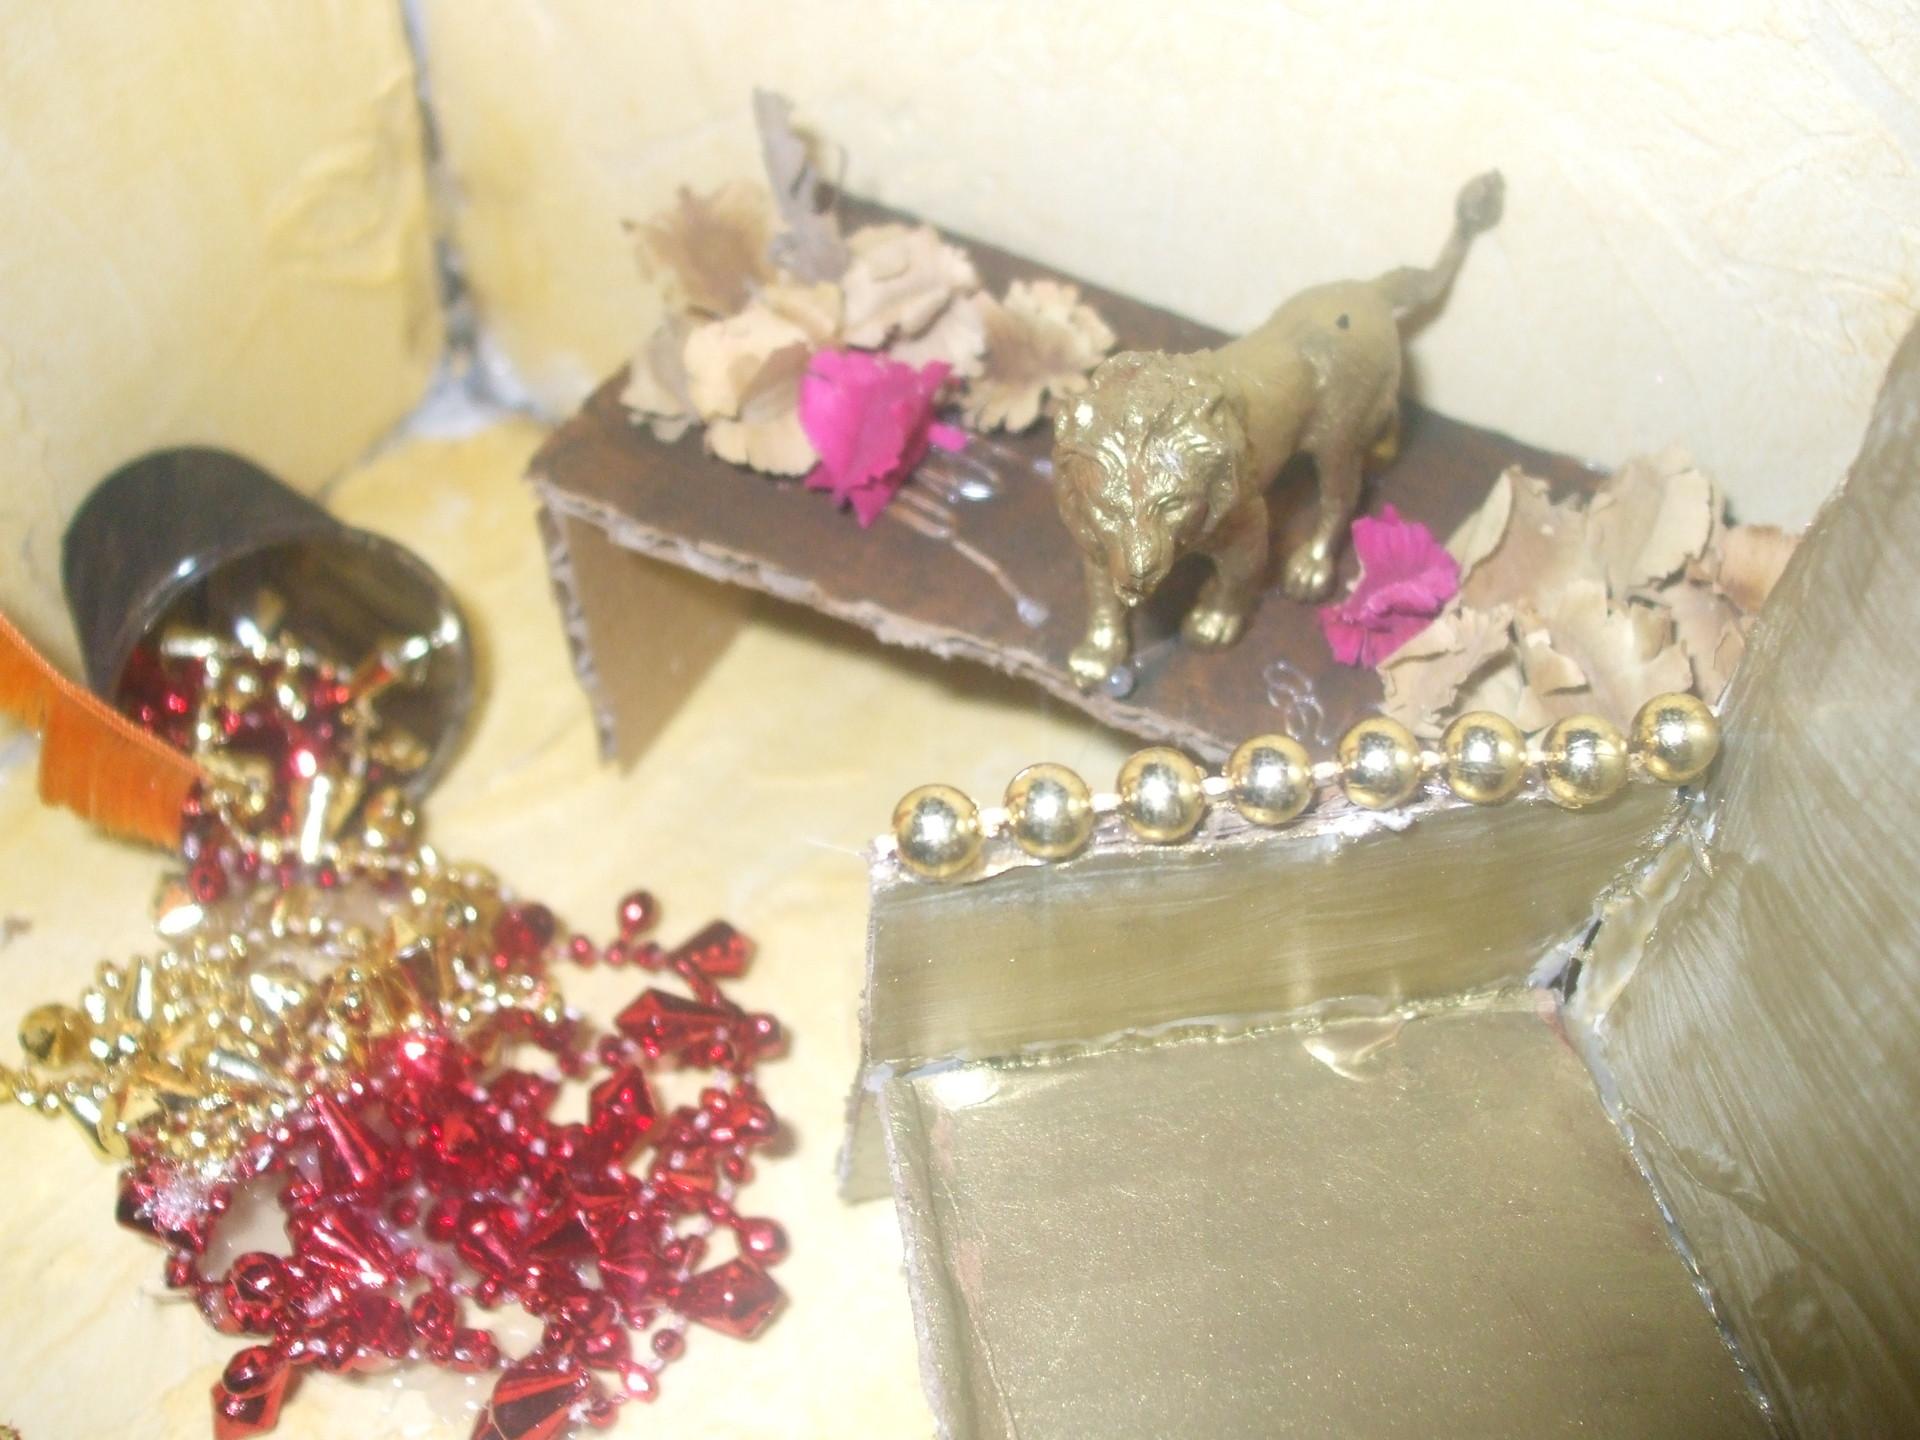 My Acient Egypt Project